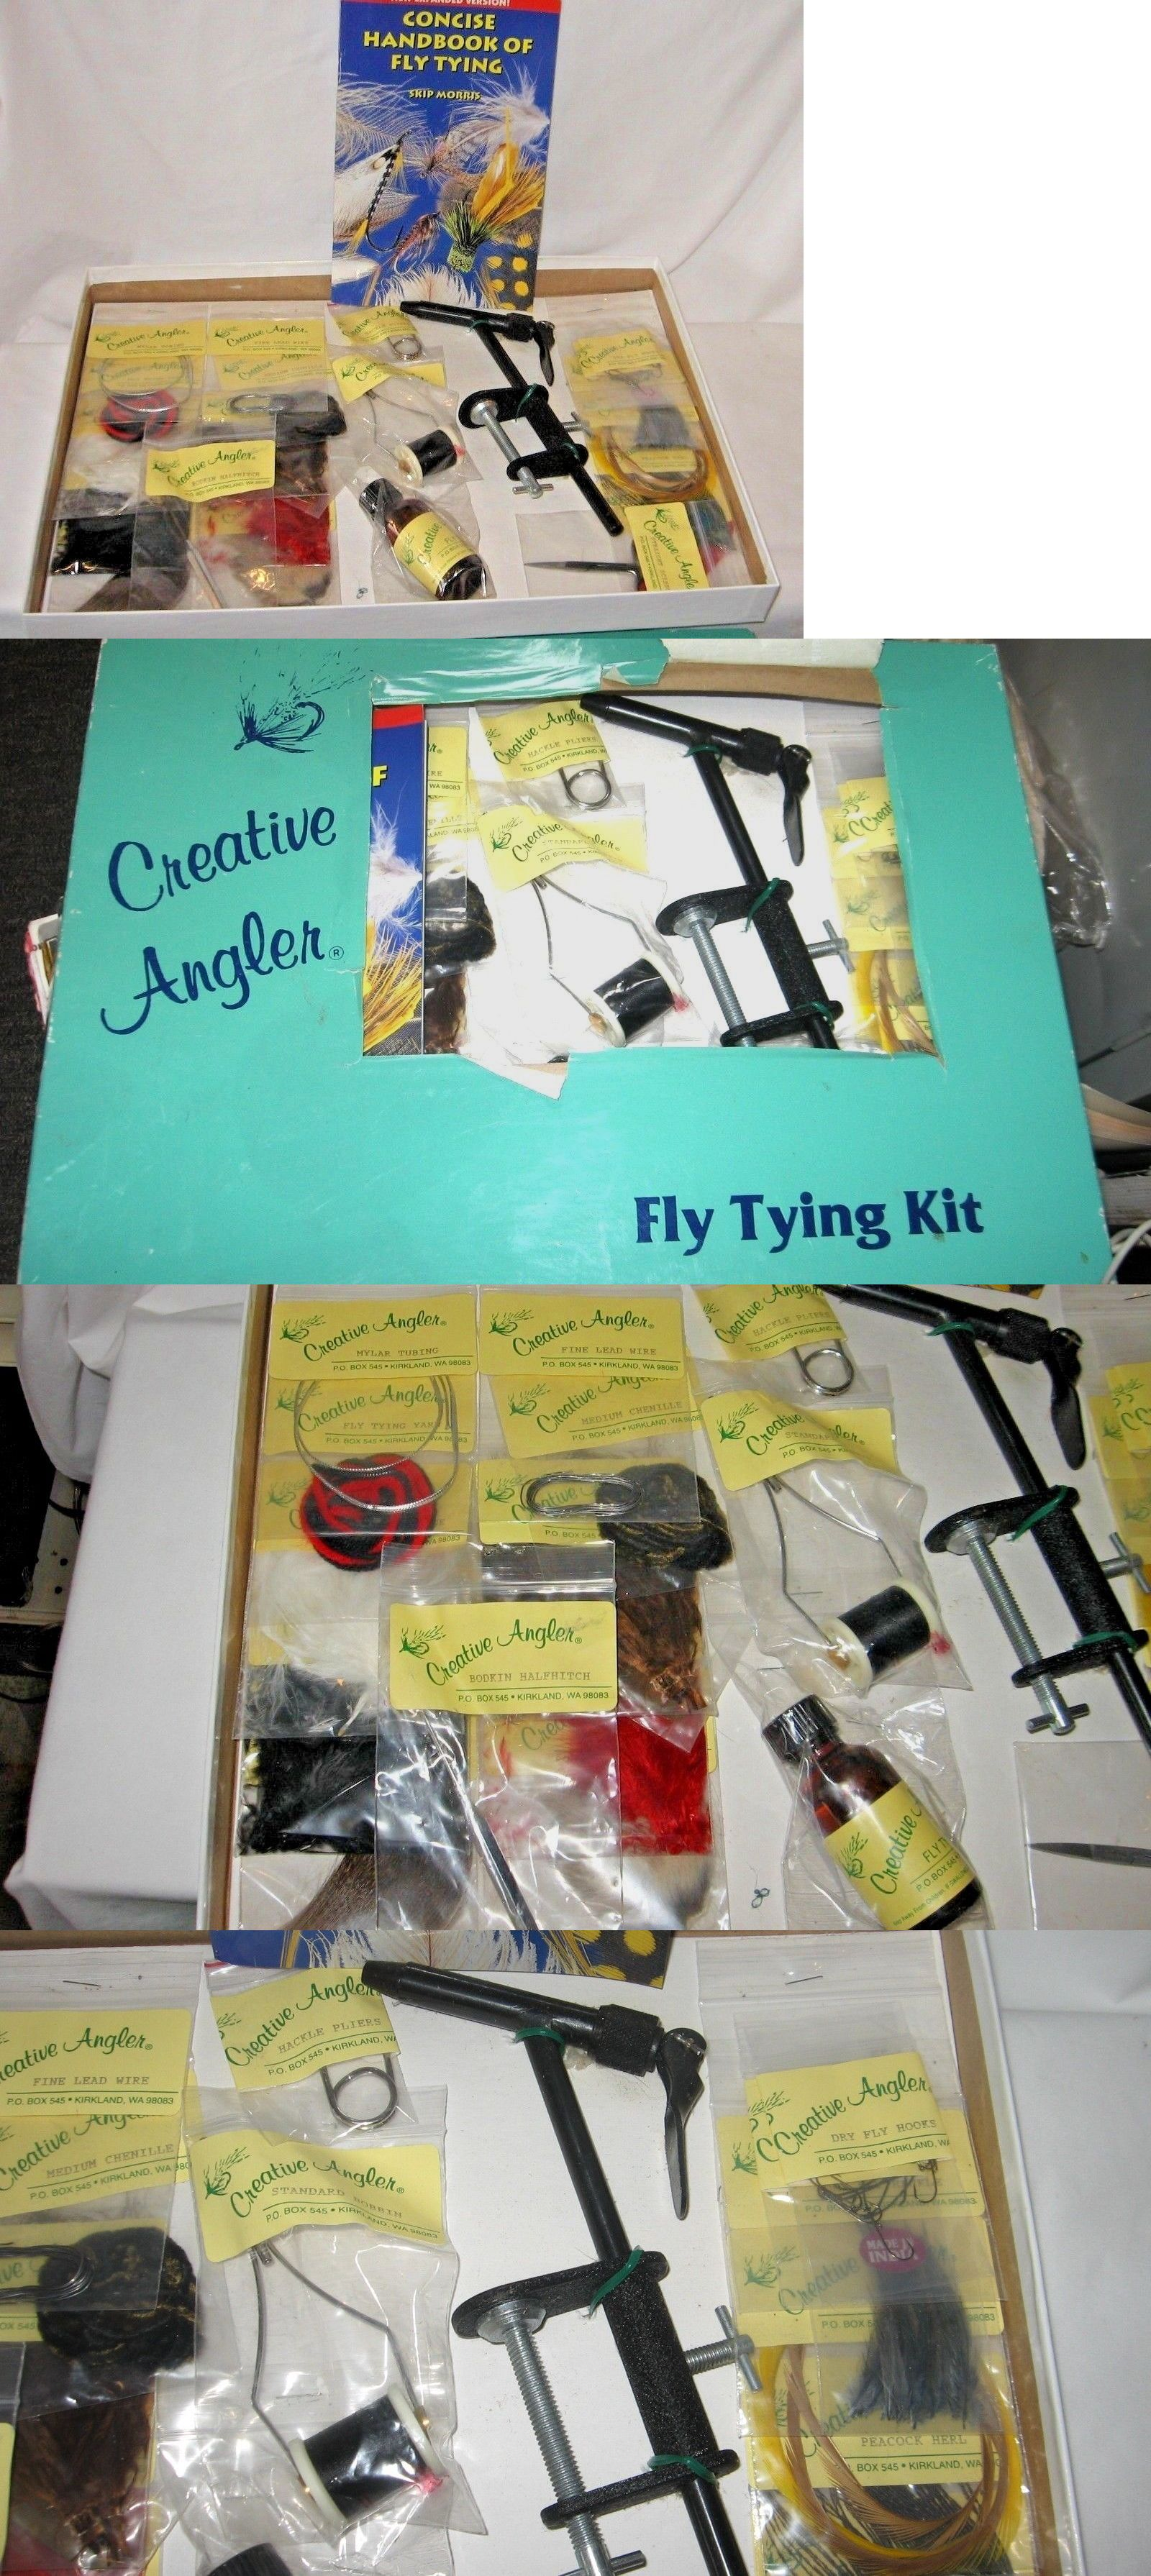 Angelsport-Artikel Angelsport-Köder, -Futtermittel & -Fliegen Umpqua Fly Fishing Deluxe Fly Tying Kit